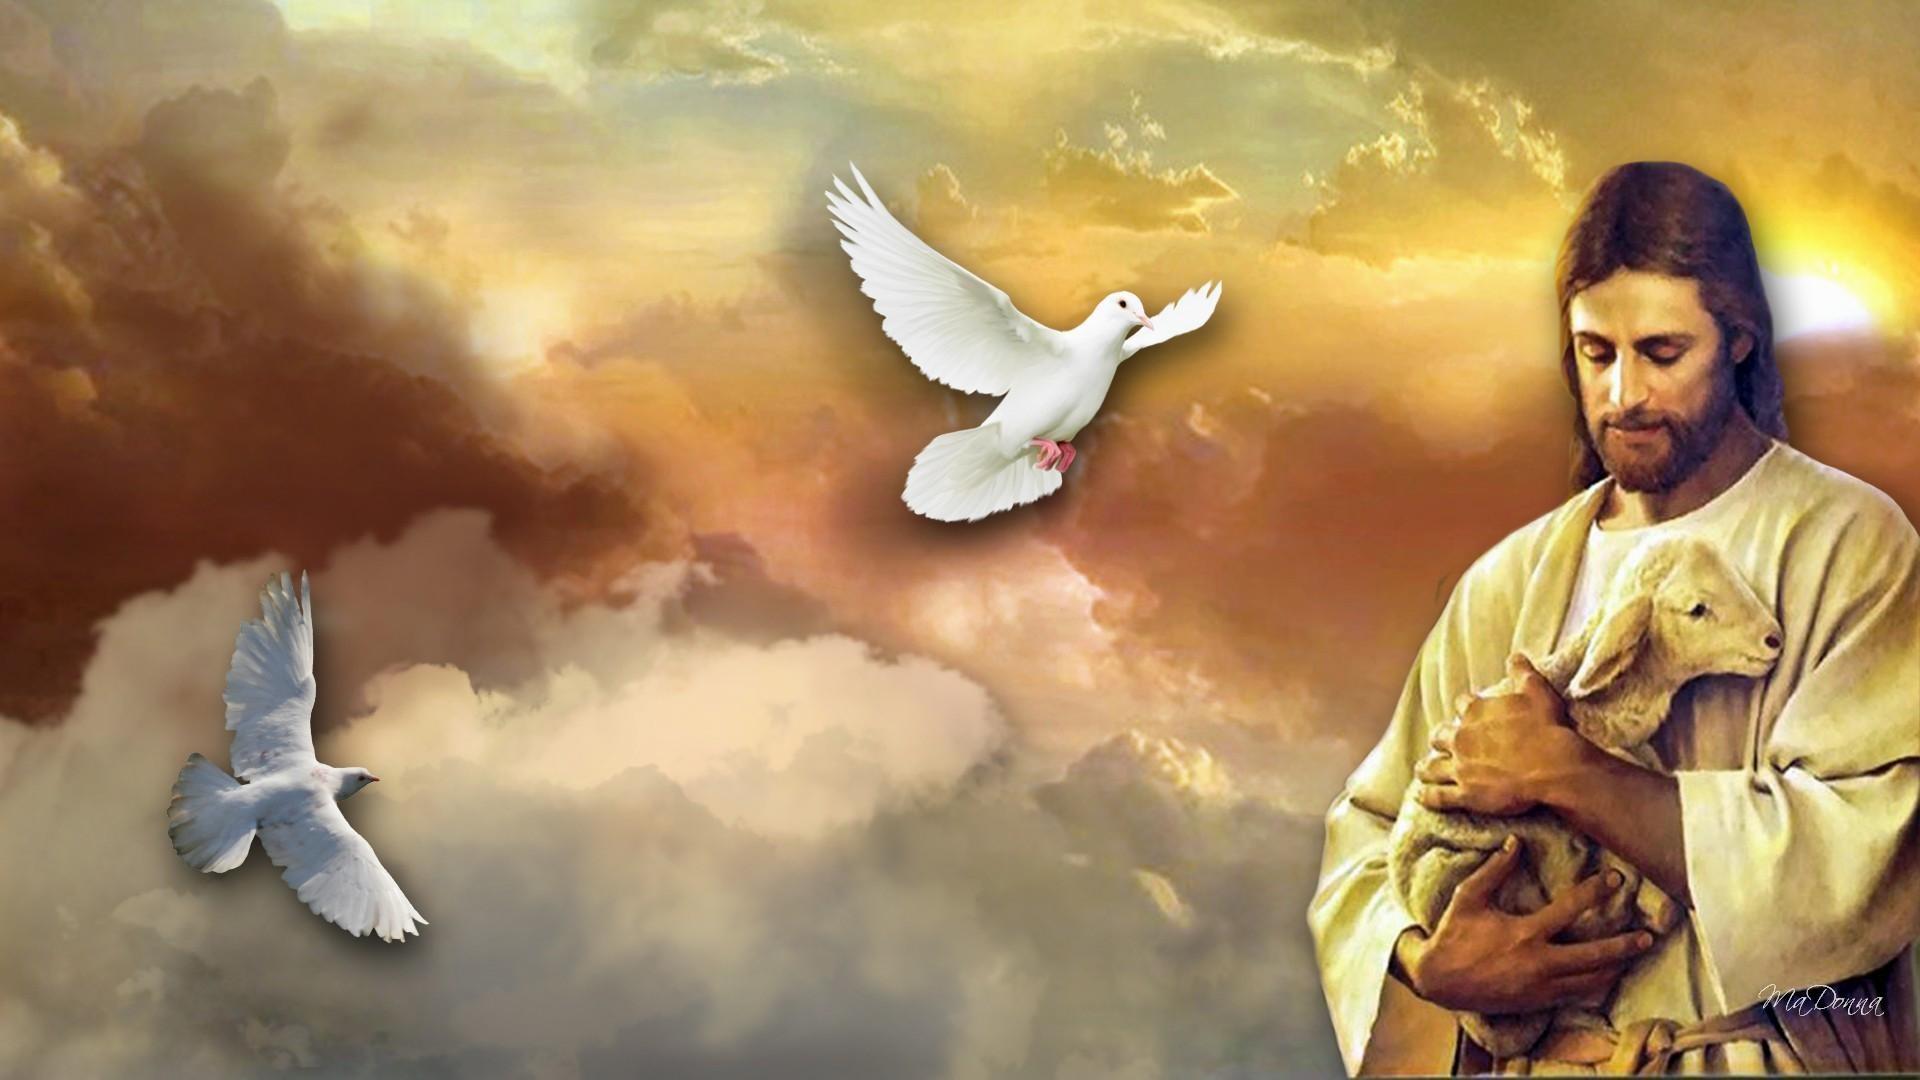 Jesus-The-Prefixed-Life-wallpaper-wpt7006200